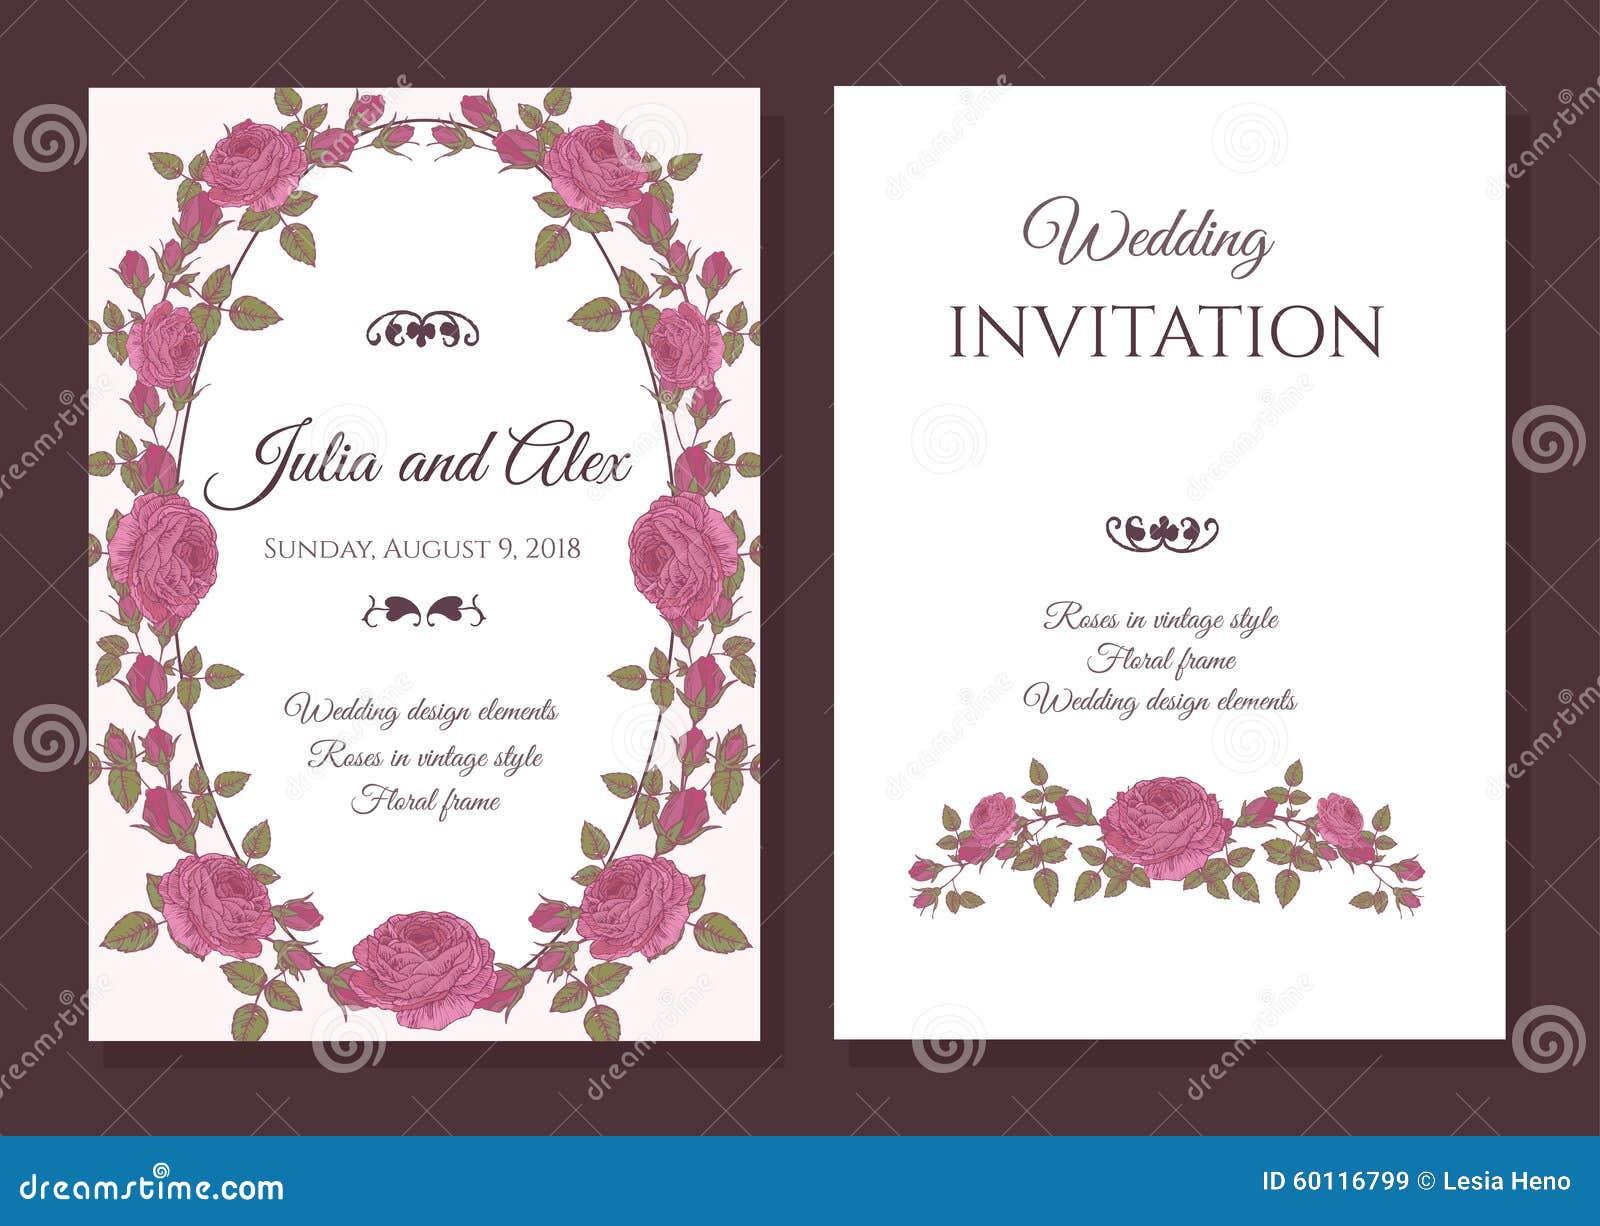 Wedding Invitation Frames: Vector Floral Wedding Invitation Card With Frame Of Pink